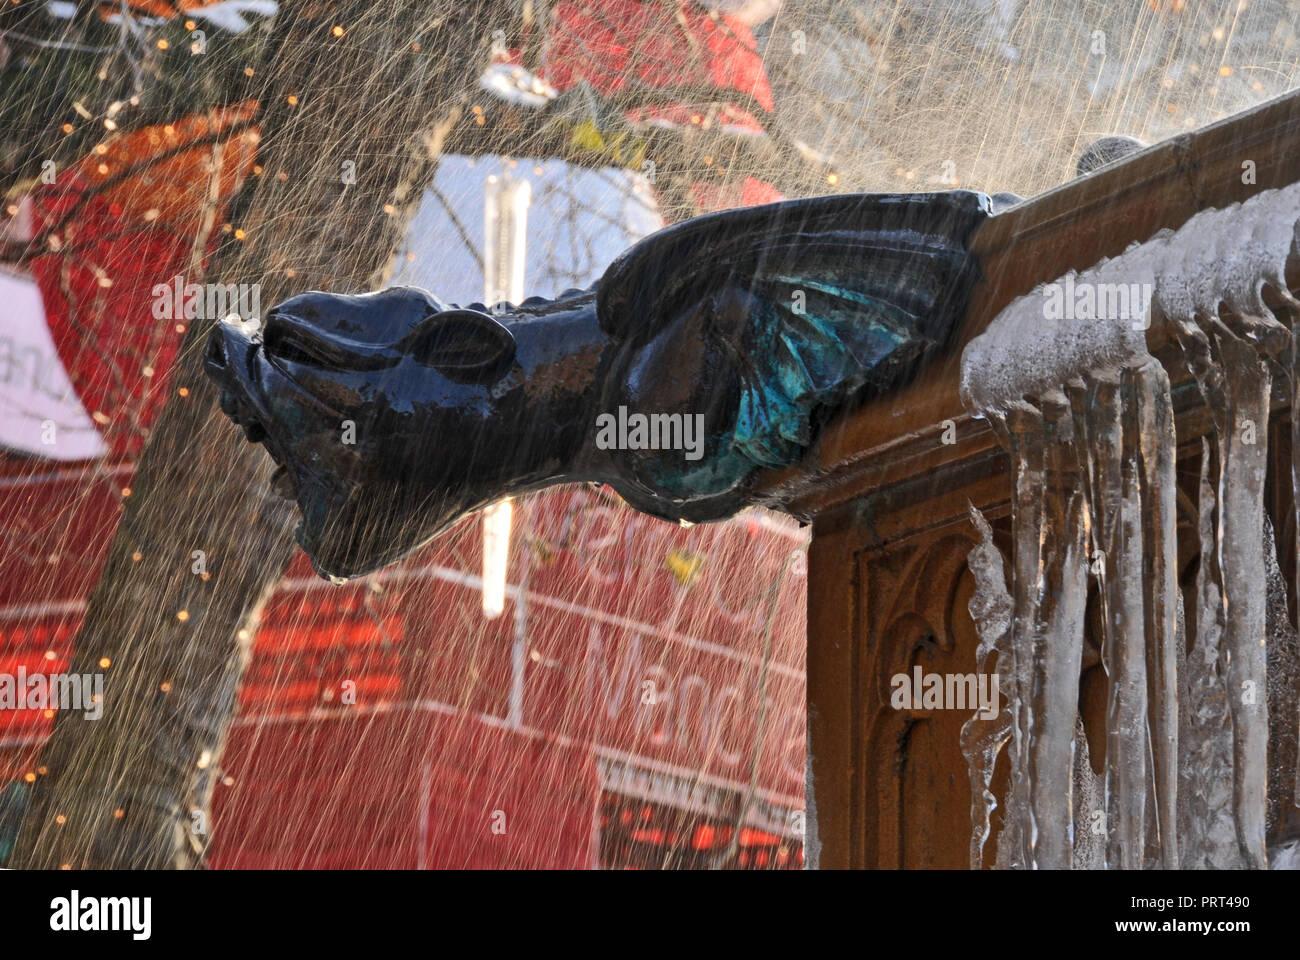 Water Fountain to Commemorate Queen Victoria's Diamond Jubilee - Stock Image